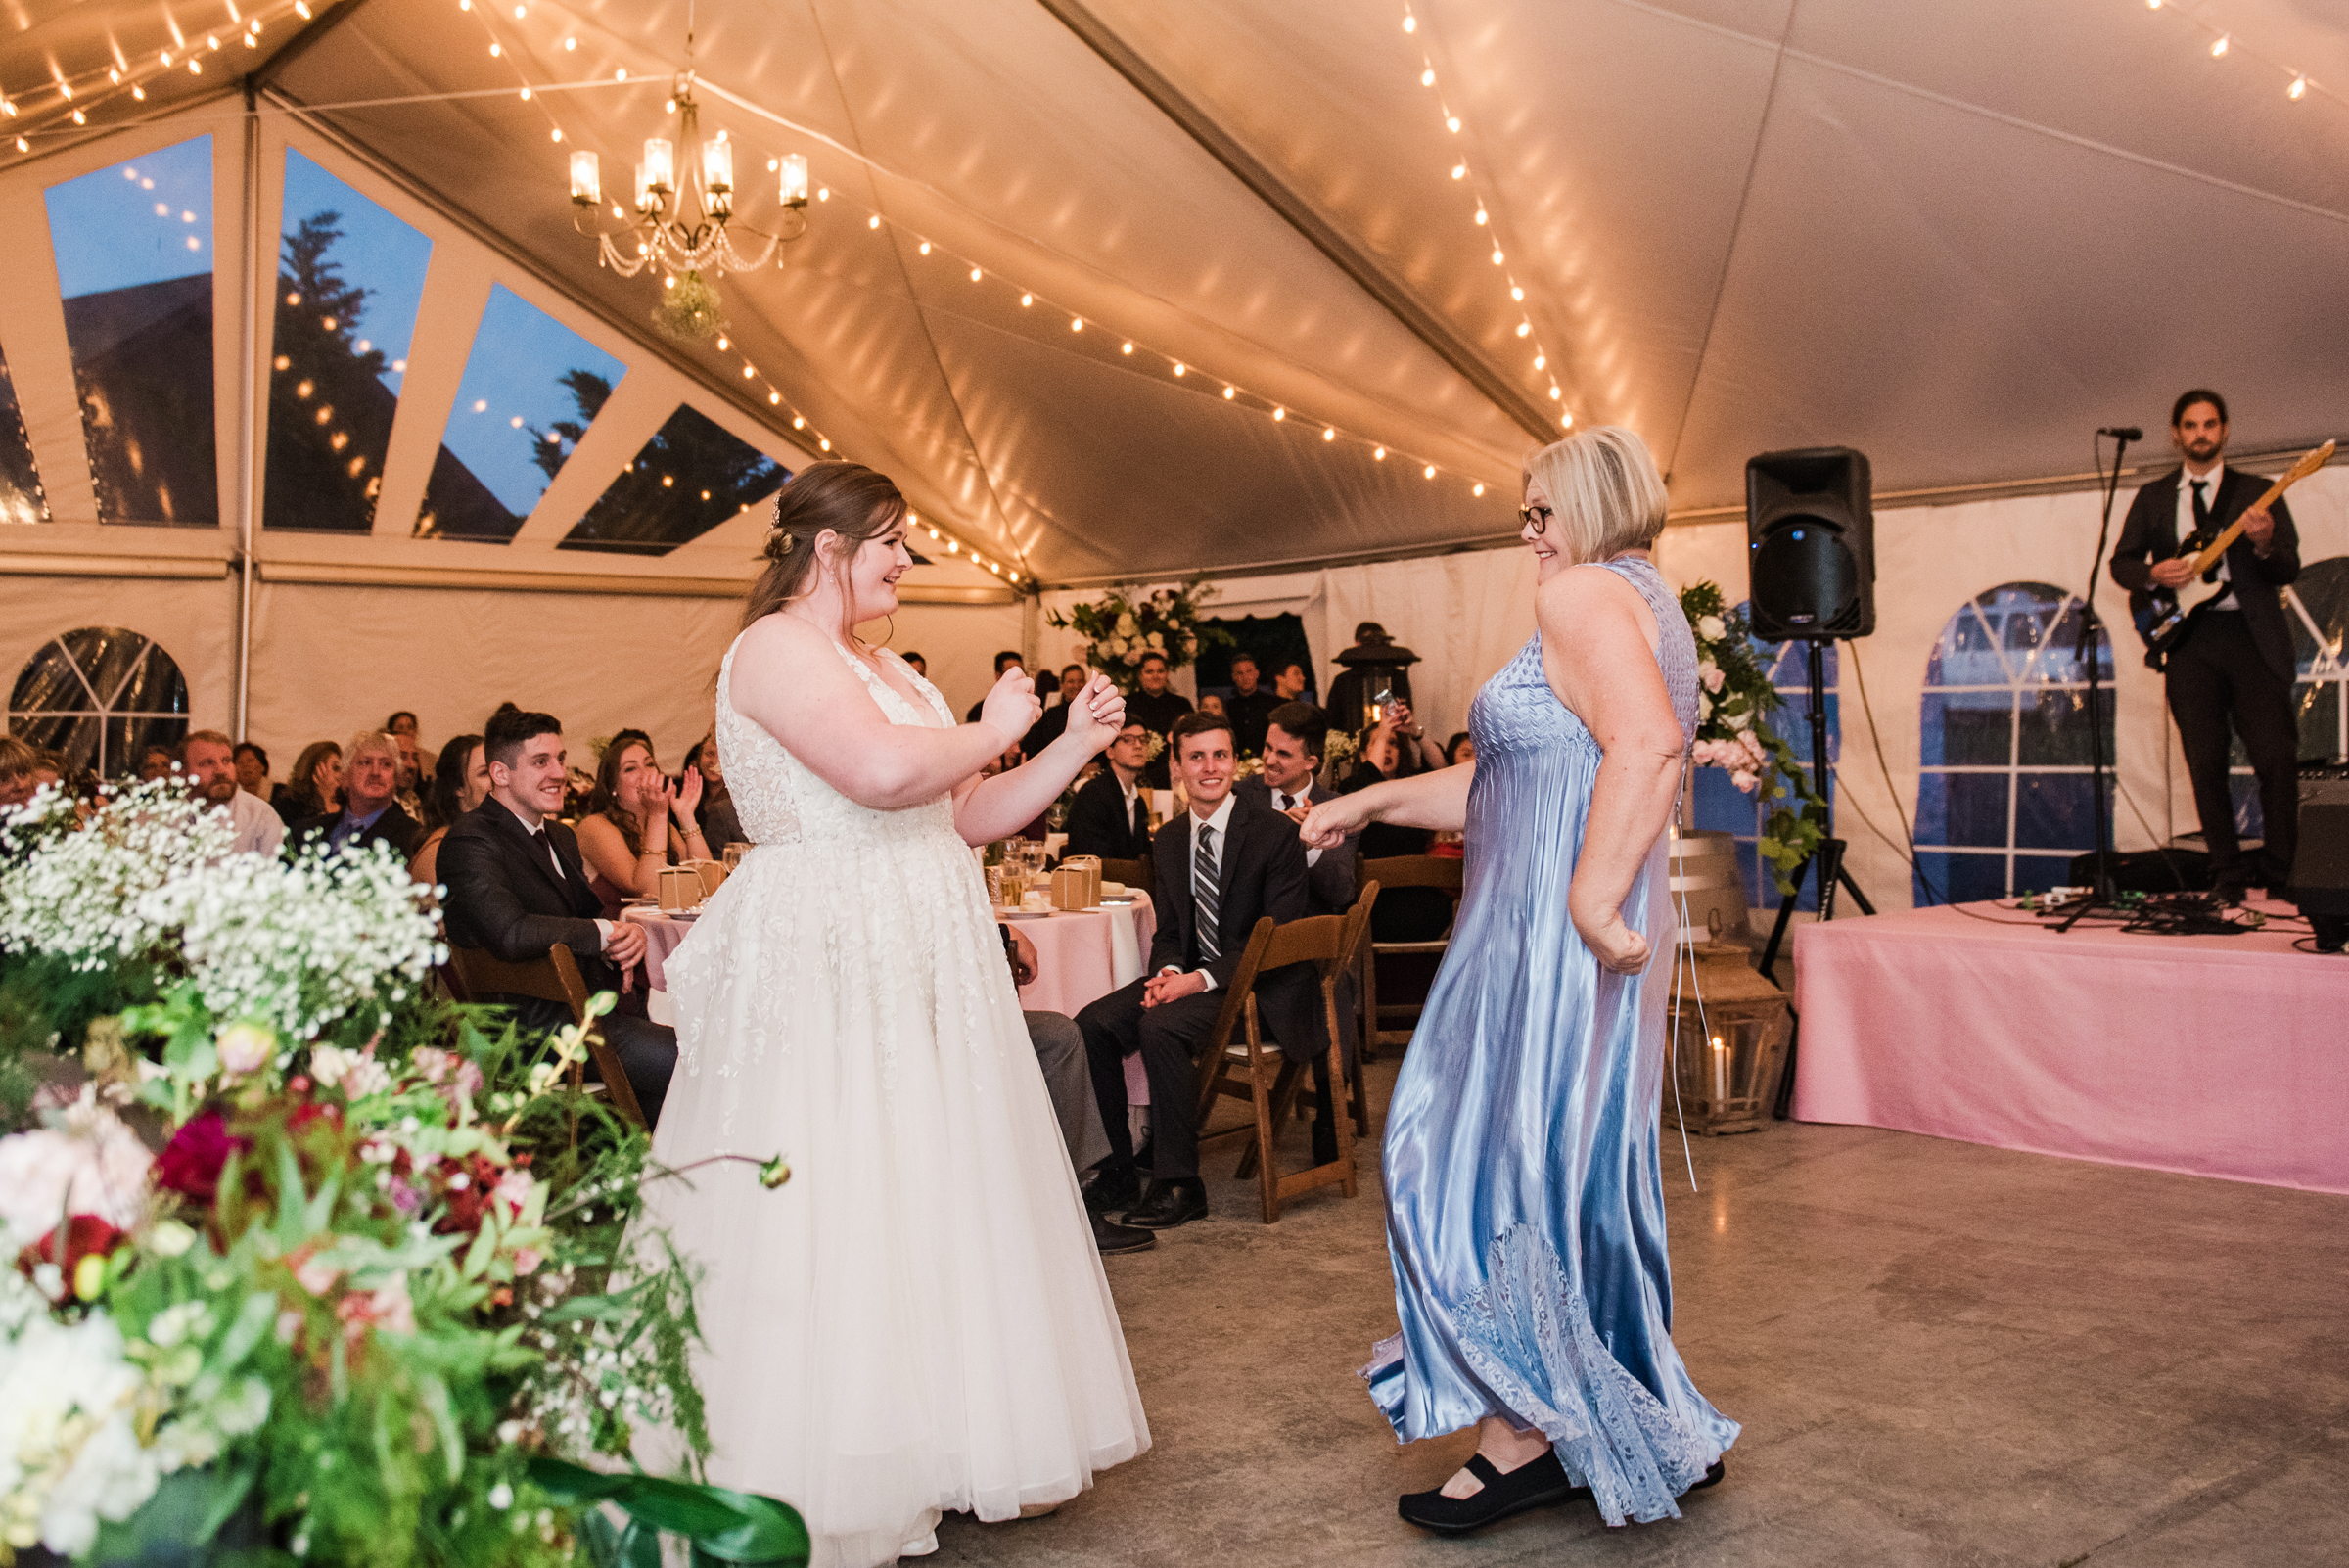 Zugibe_Vineyards_Finger_Lakes_Wedding_JILL_STUDIO_Rochester_NY_Photographer_DSC_4305.jpg